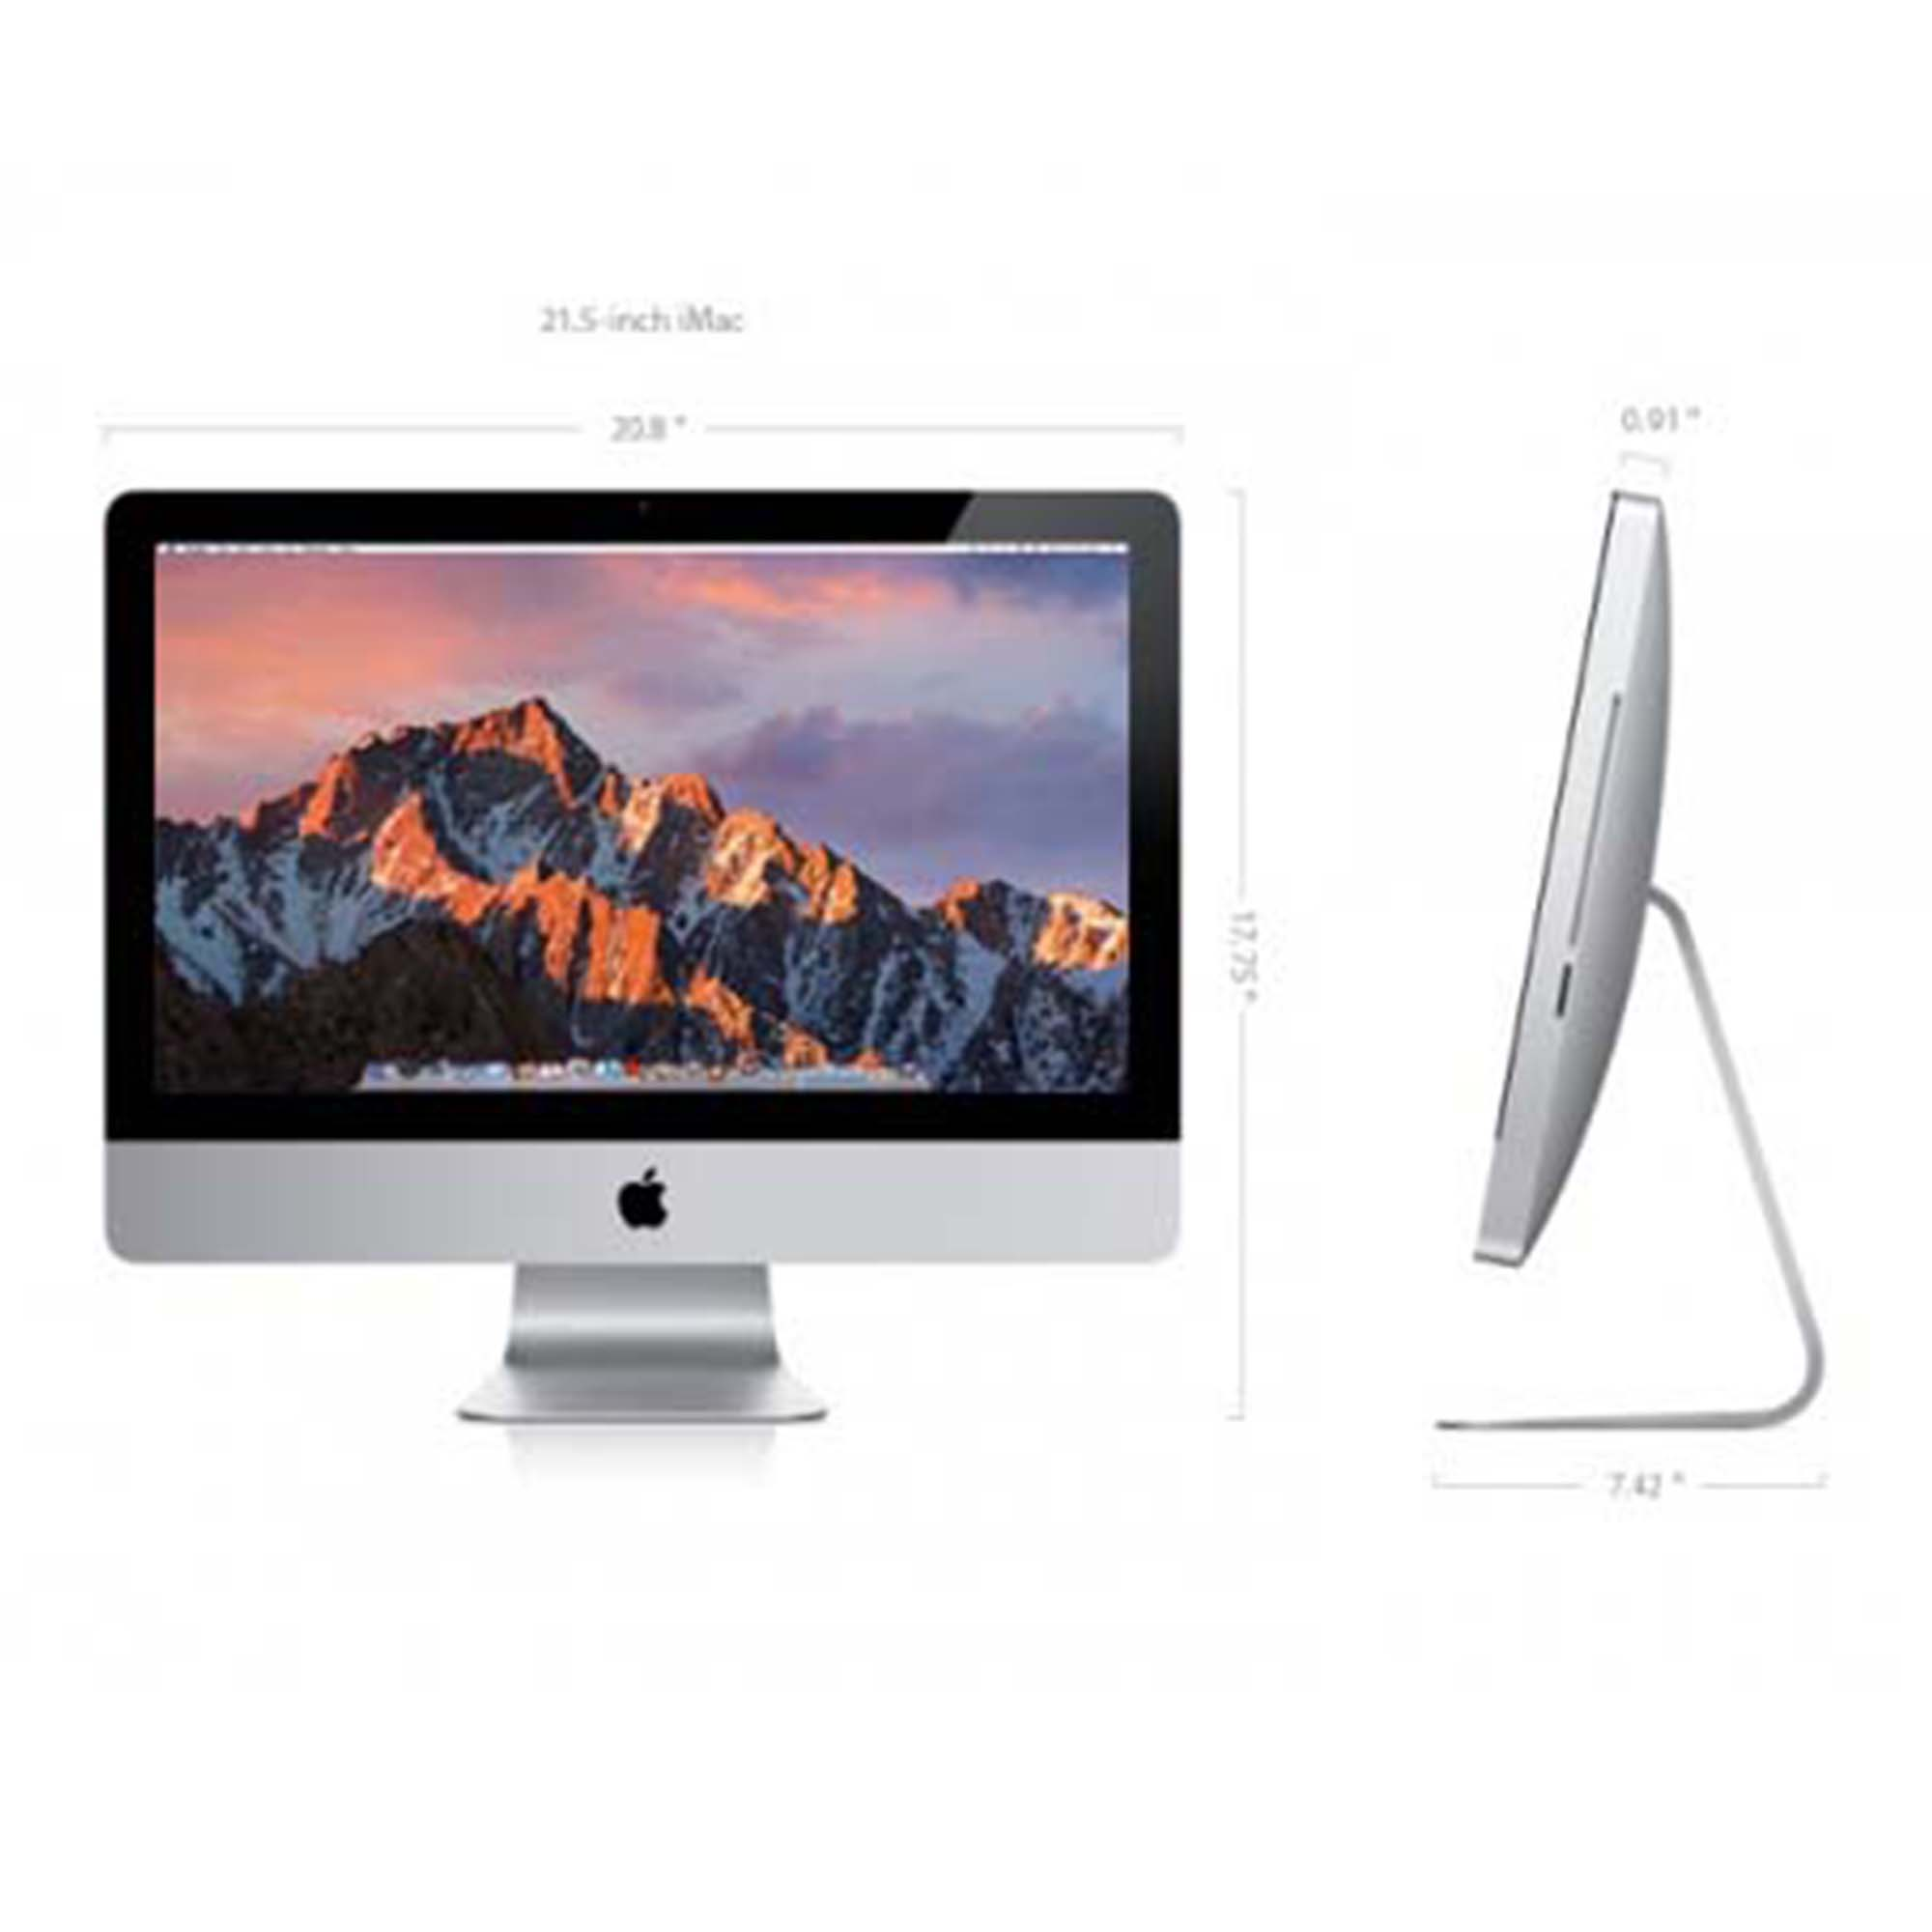 "21"" Apple iMac 2.7GHz i5 16GB Memory / 1TB HDD (Turbo Boost to 3.2GHz) - Refurbished"